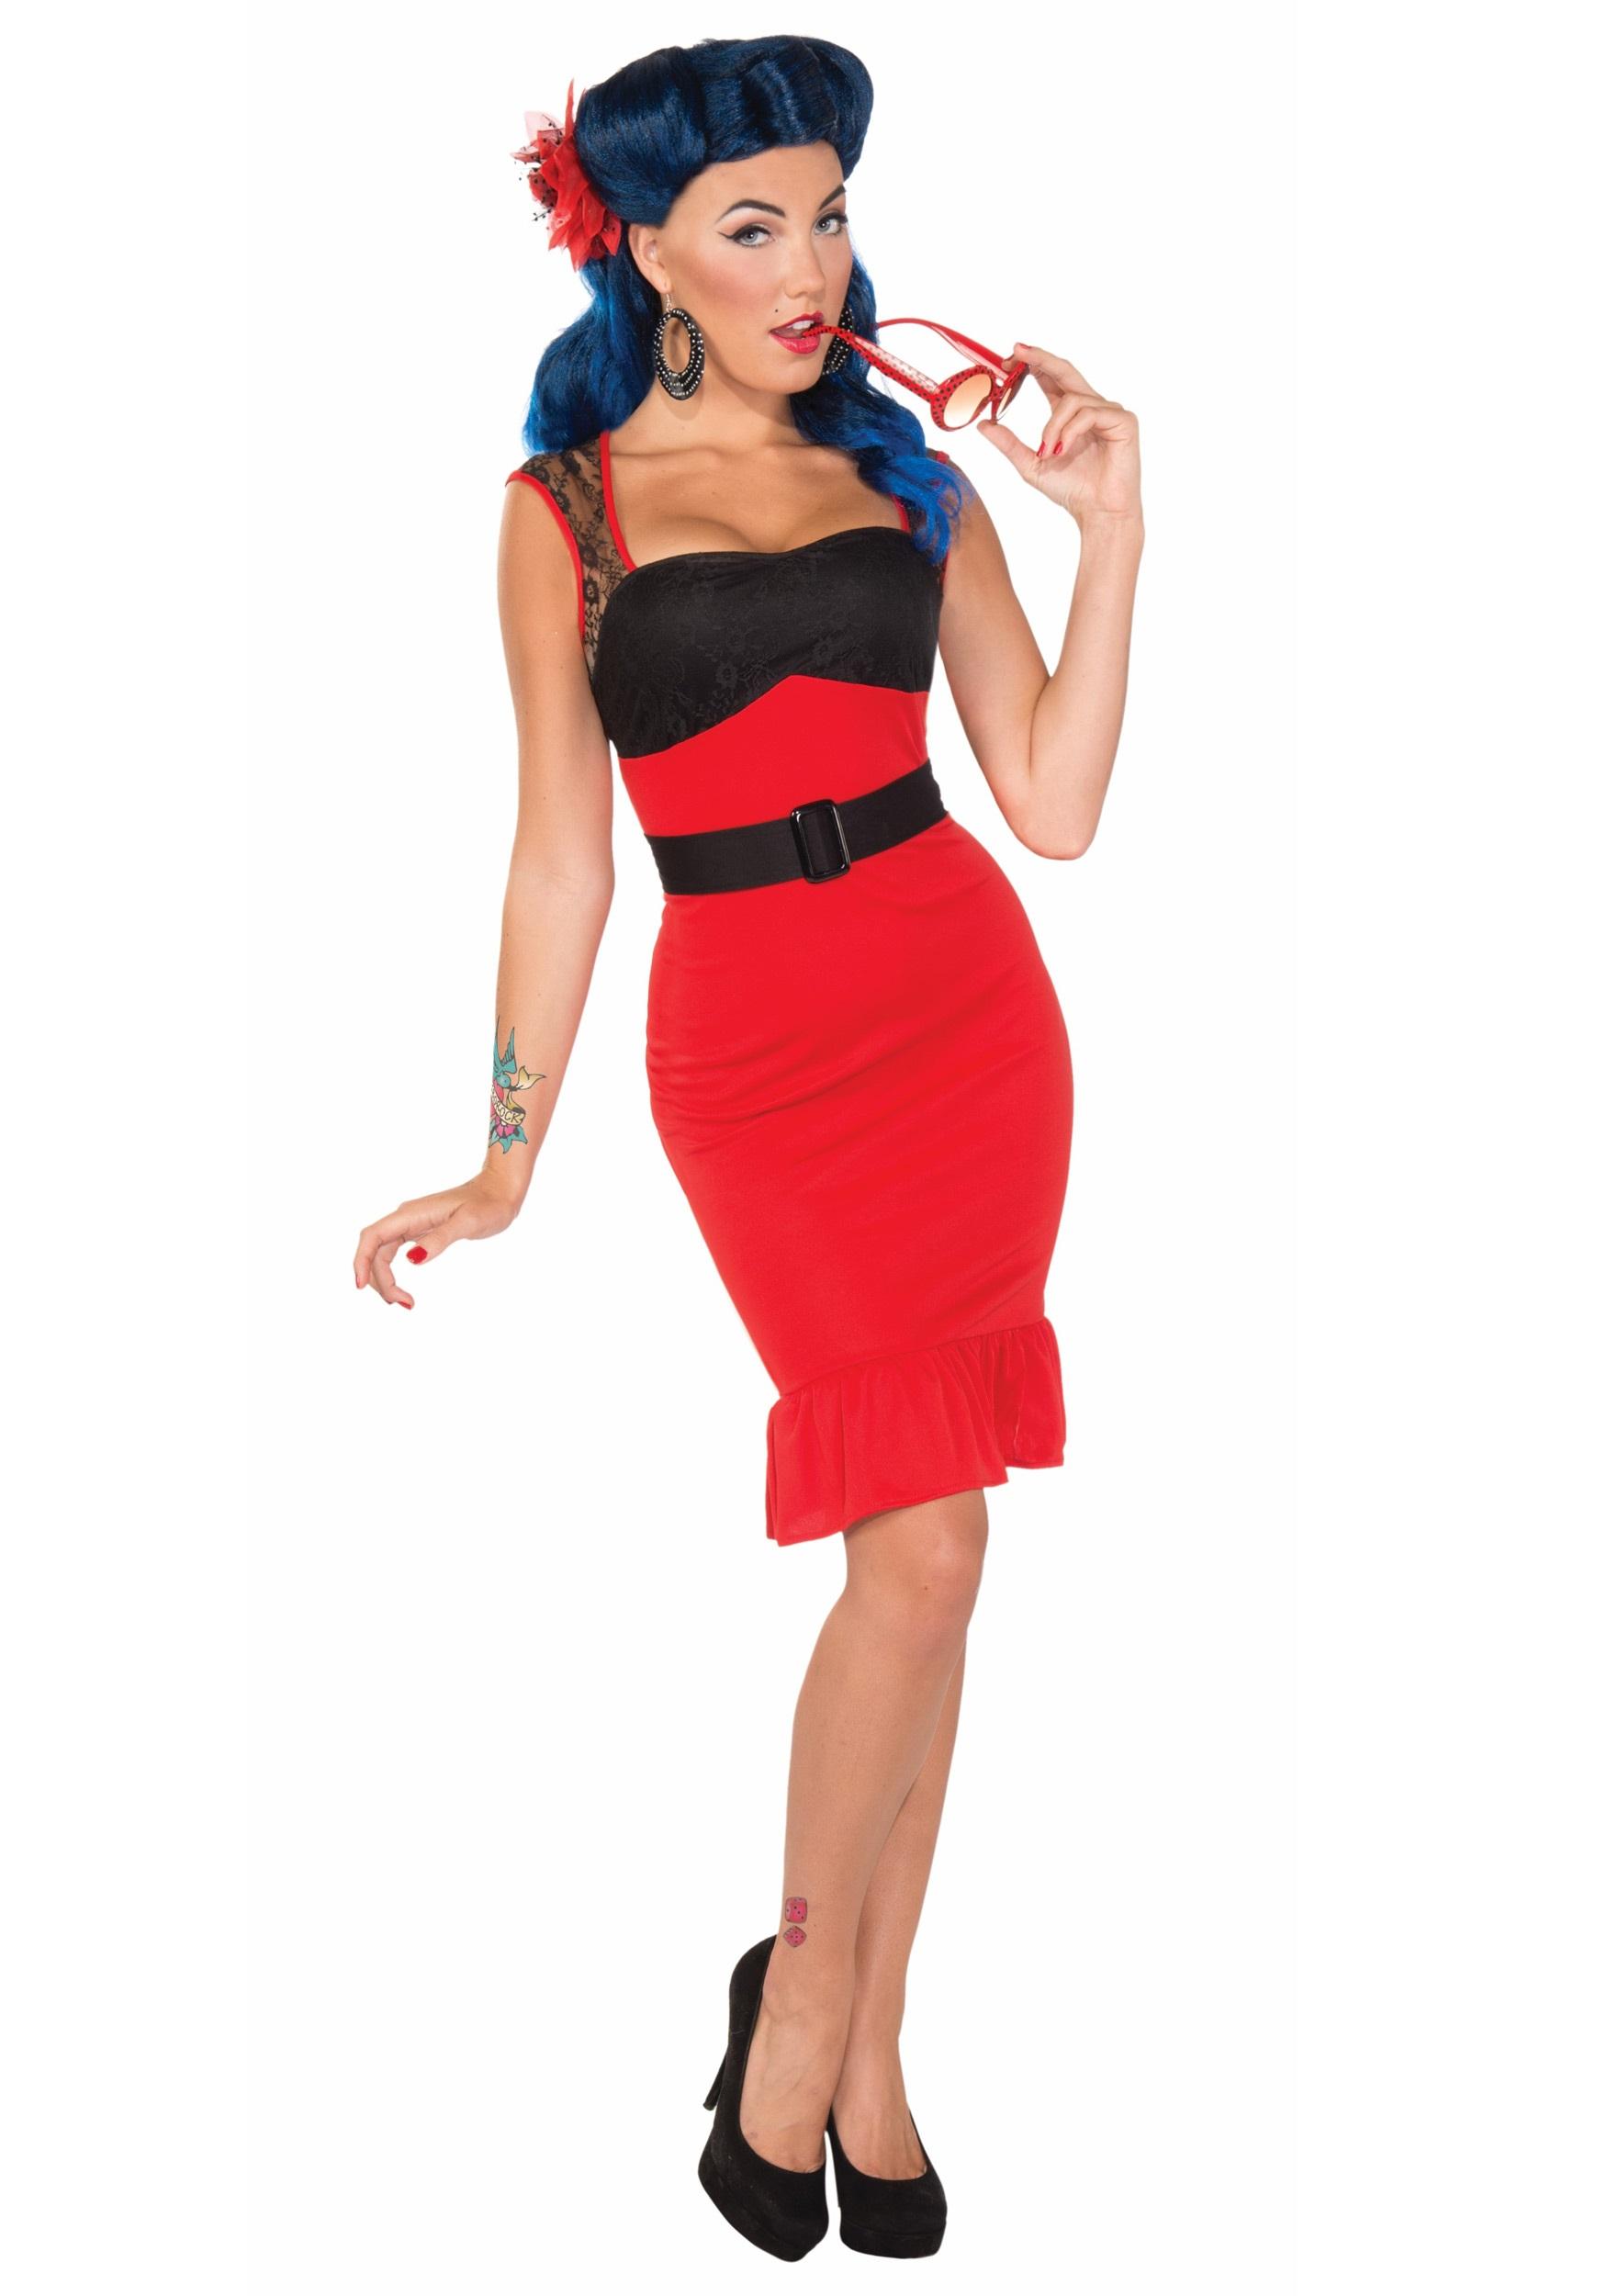 Scarlet Rose Rock-a-billy Dress  sc 1 st  Halloween Costumes & Scarlet Rose Rock-a-billy Dress - Halloween Costumes